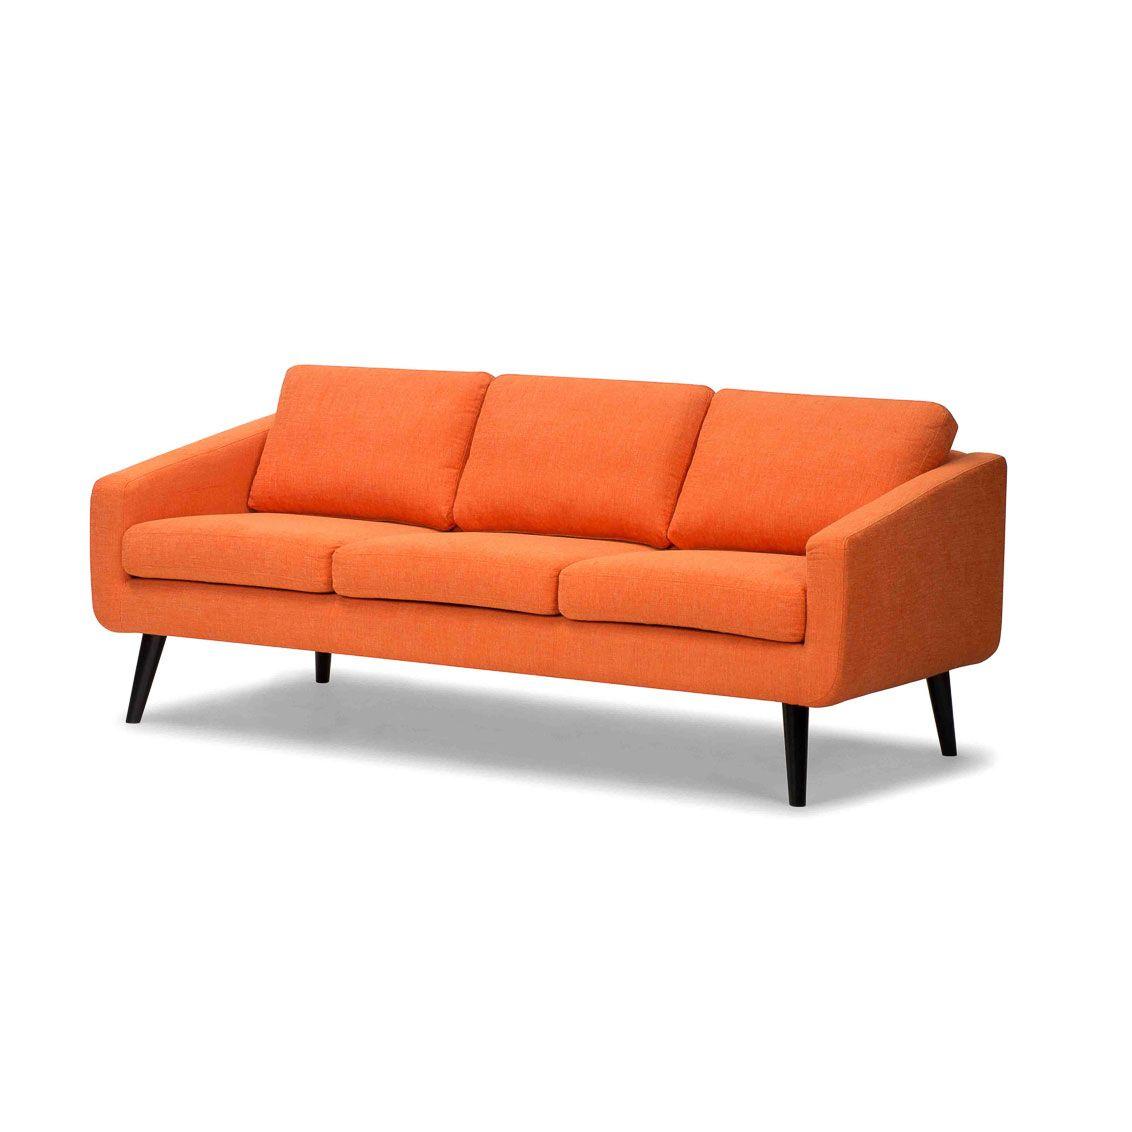 Furniture And Decor For The Modern Lifestyle Retro Sofa Danish